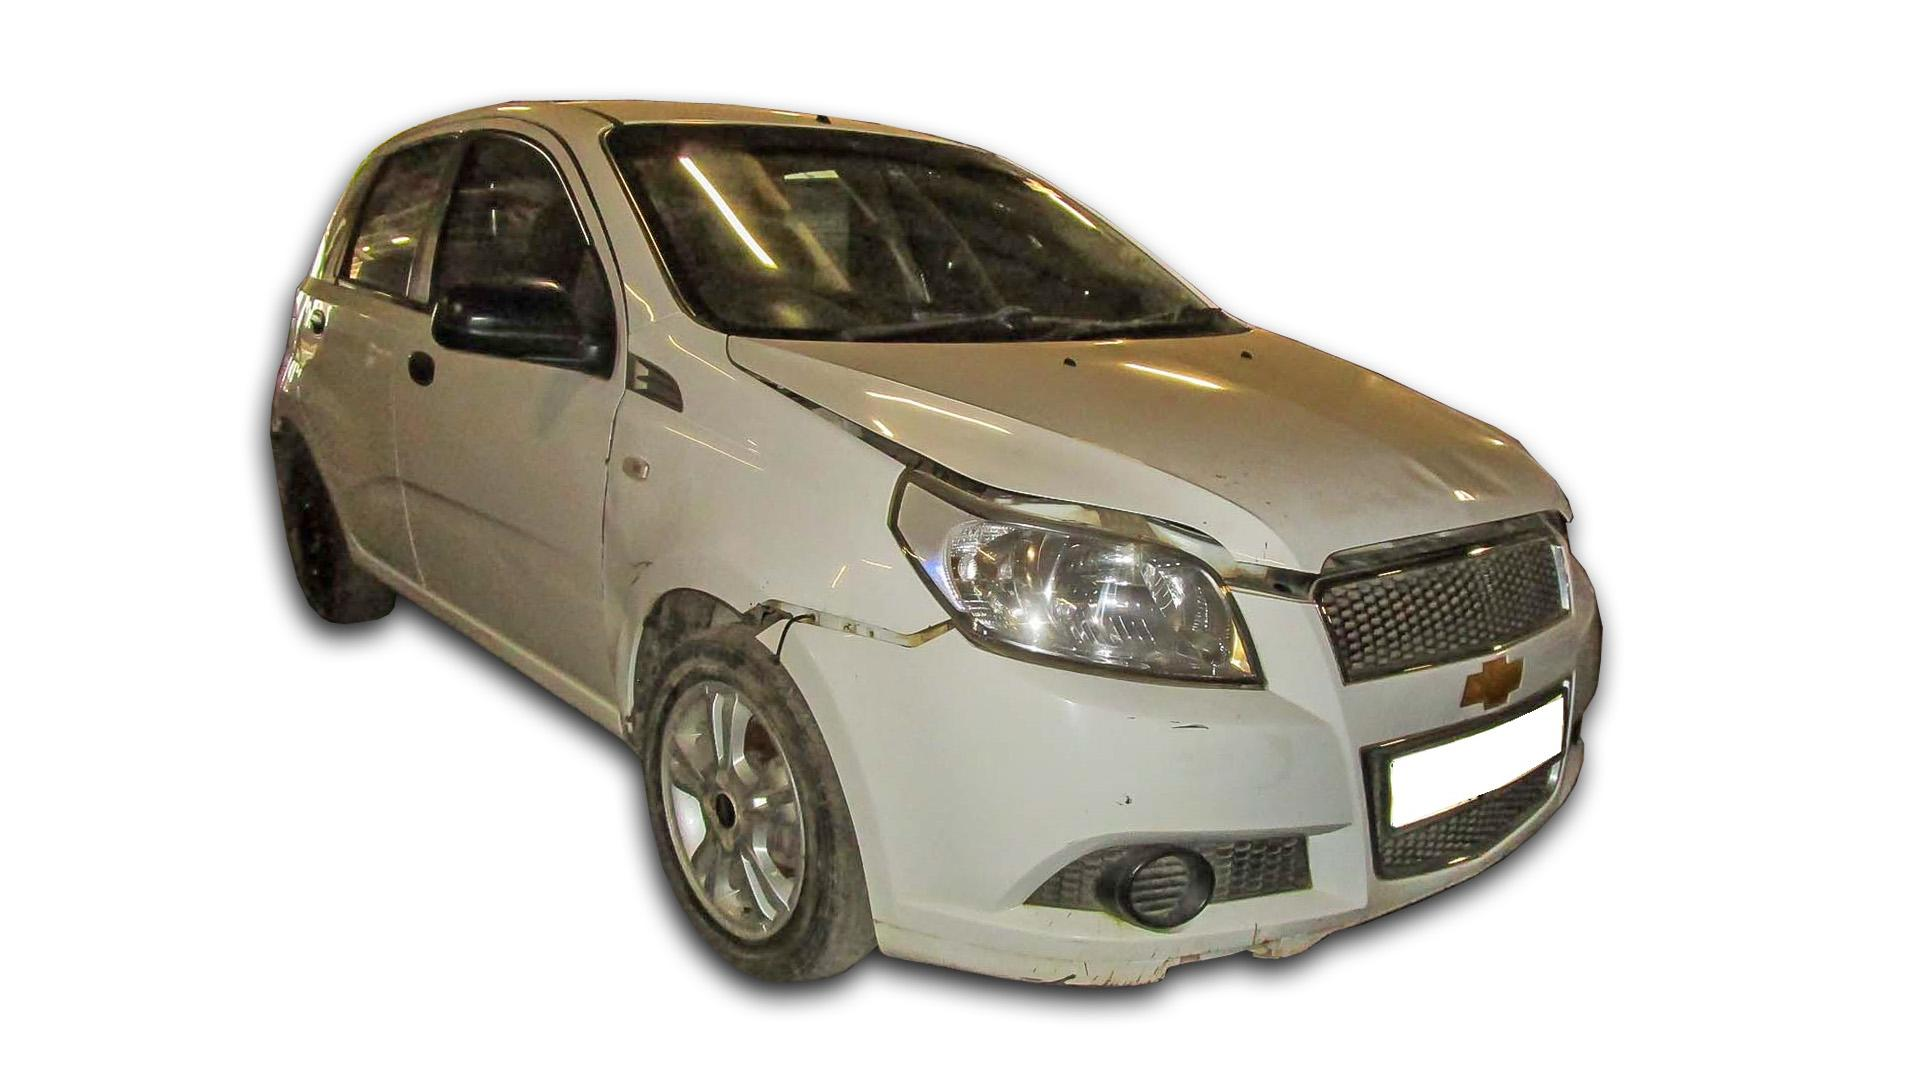 Chevrolet Aveo 1.6 L 5DR